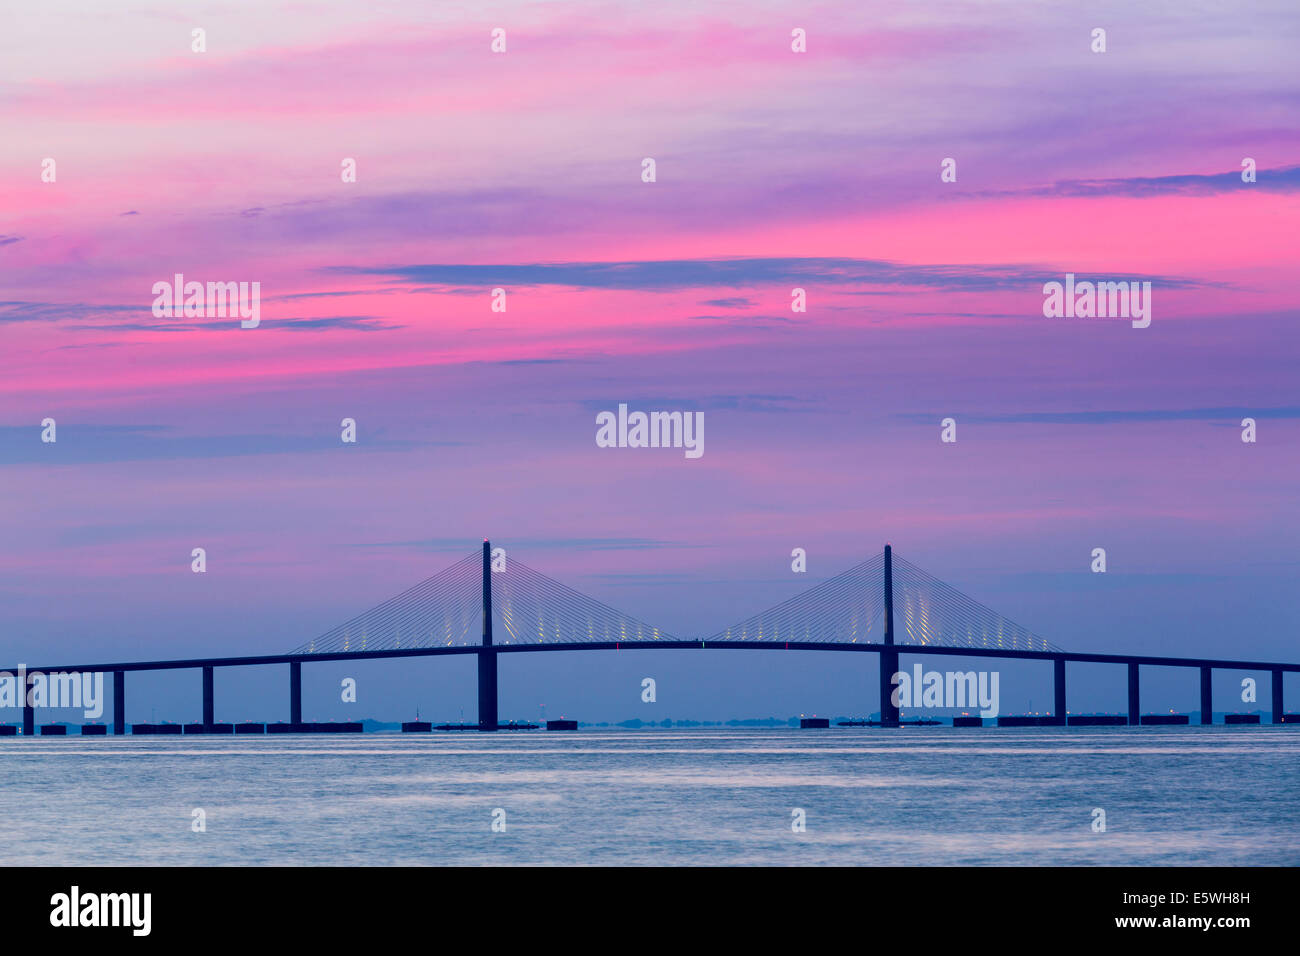 Sunrise over the Sunshine Skyway Bridge from St Petersburg, Florida, USA across Tampa Bay. - Stock Image